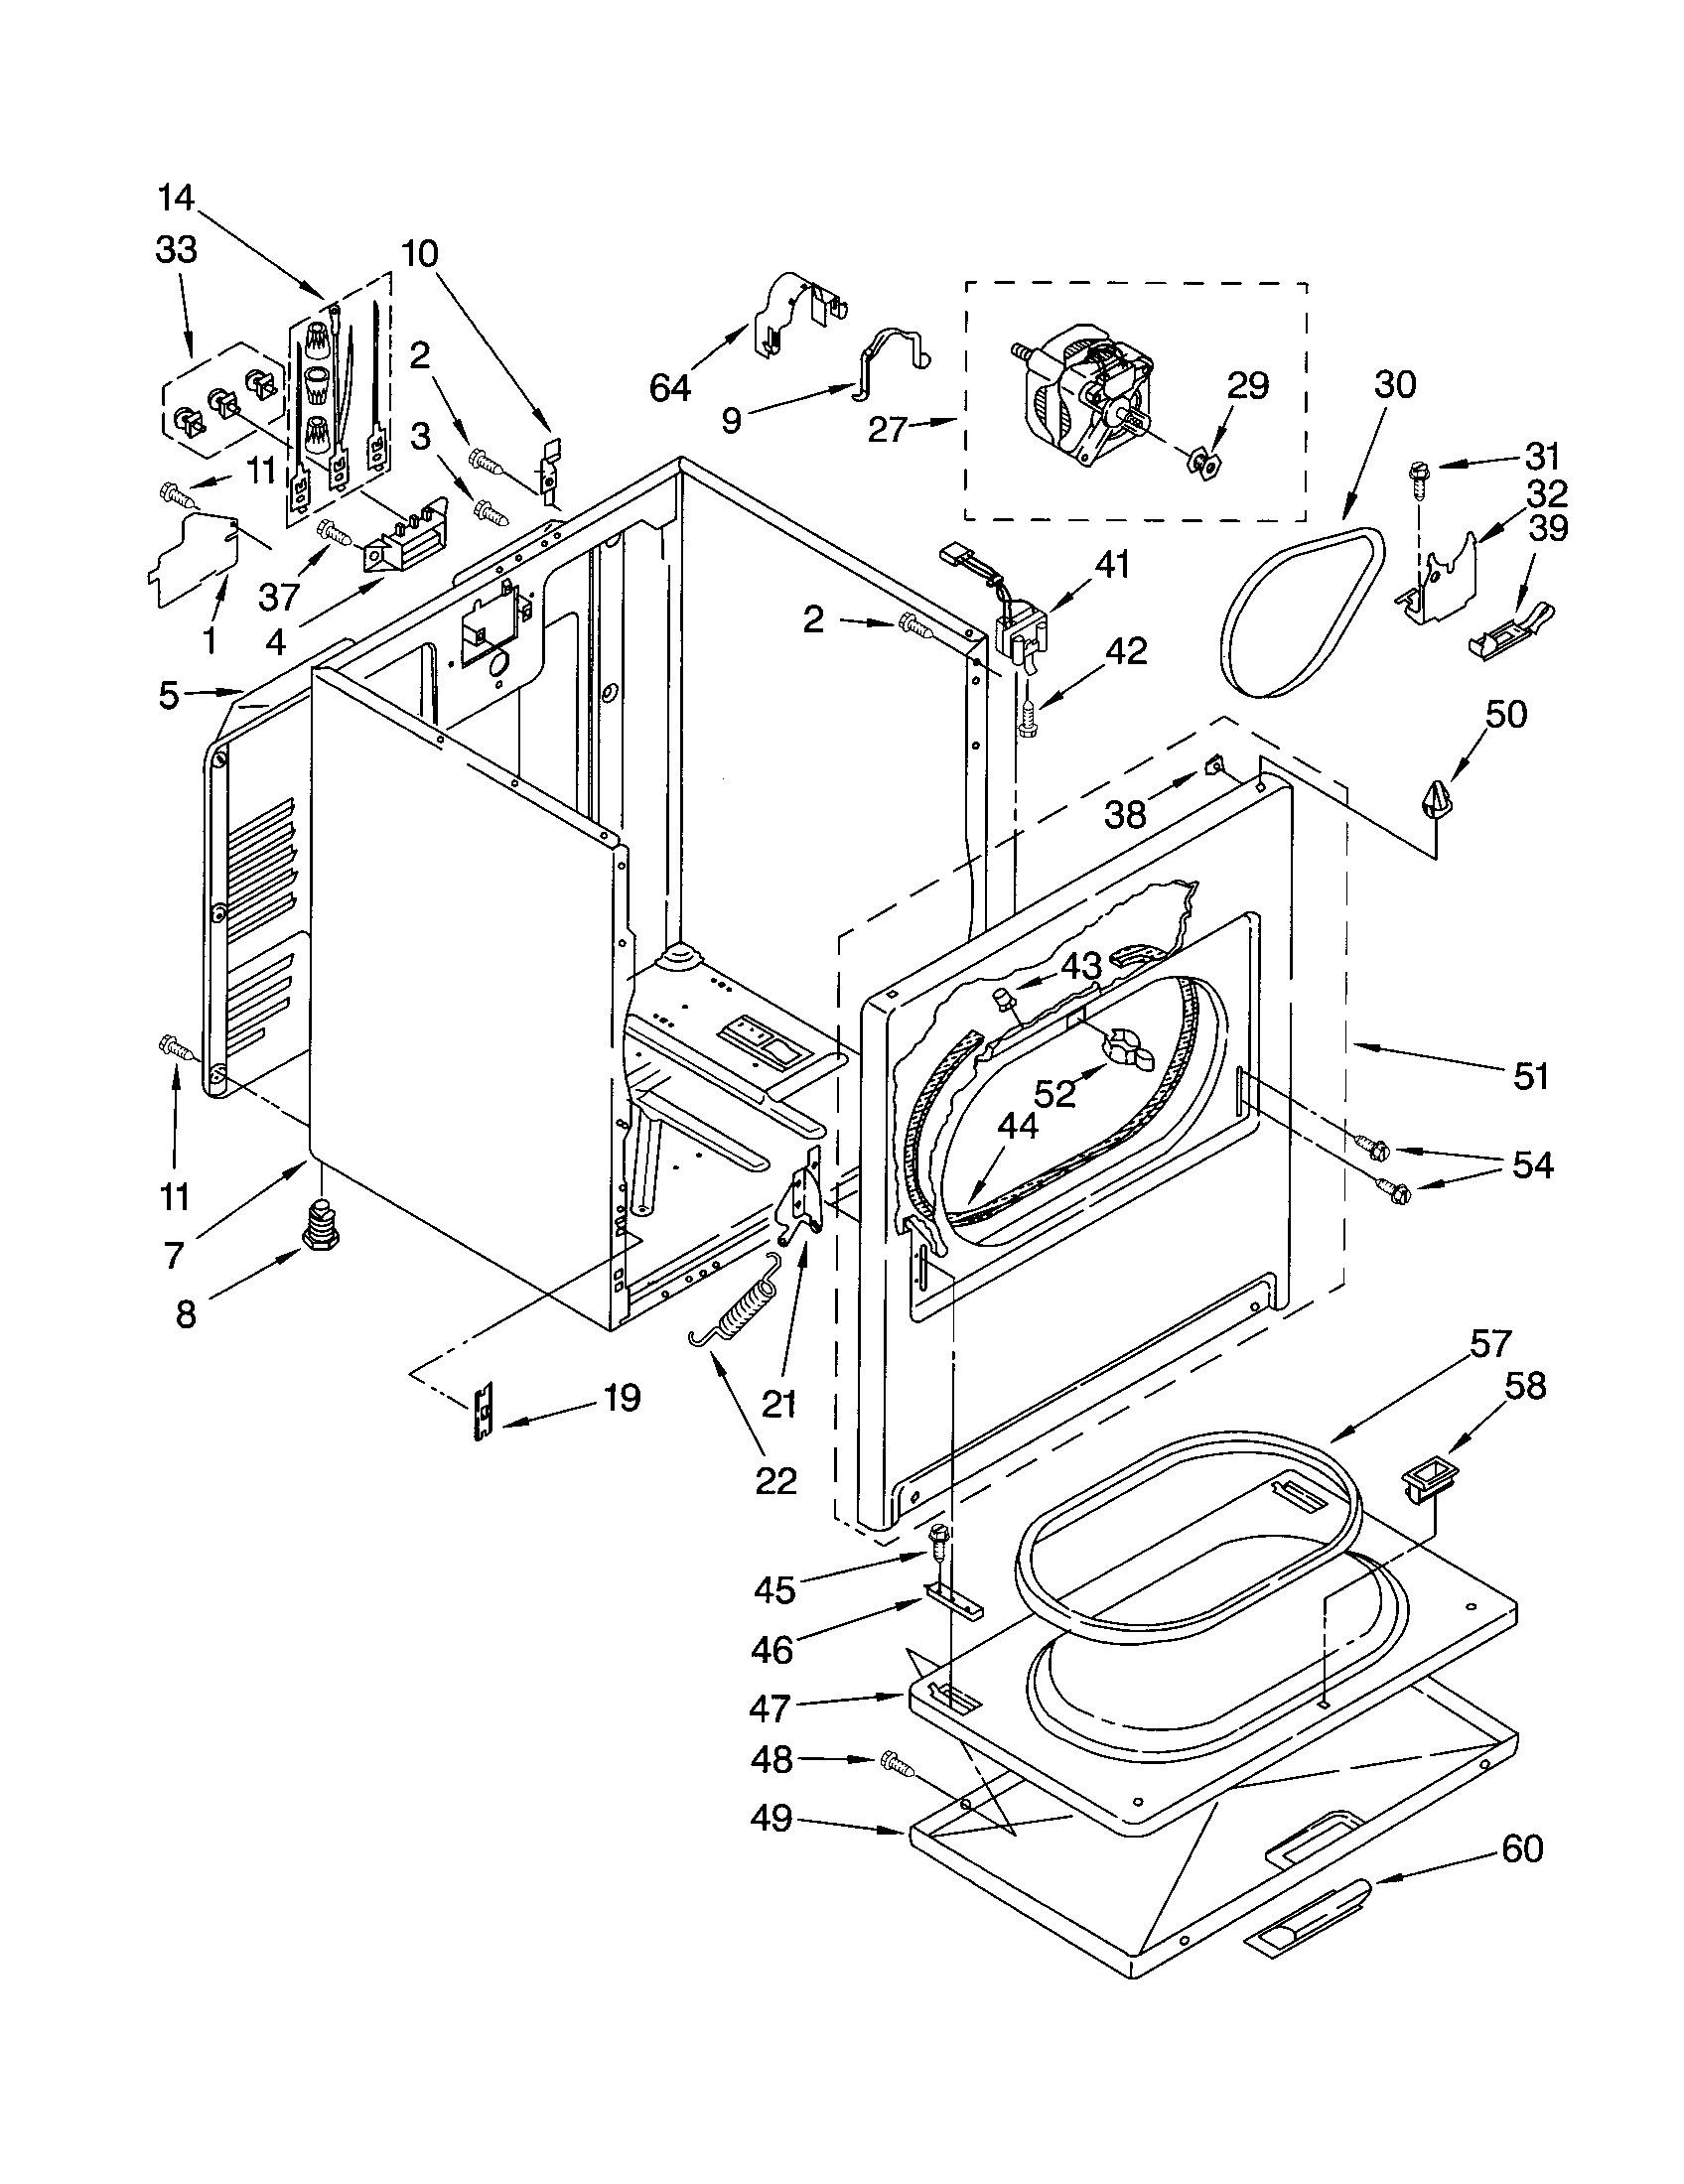 Kenmore Dryer Wiring Diagram Wiring Diagram In Addition Roper Electric Dryer Wiring Diagram Also Of Kenmore Dryer Wiring Diagram